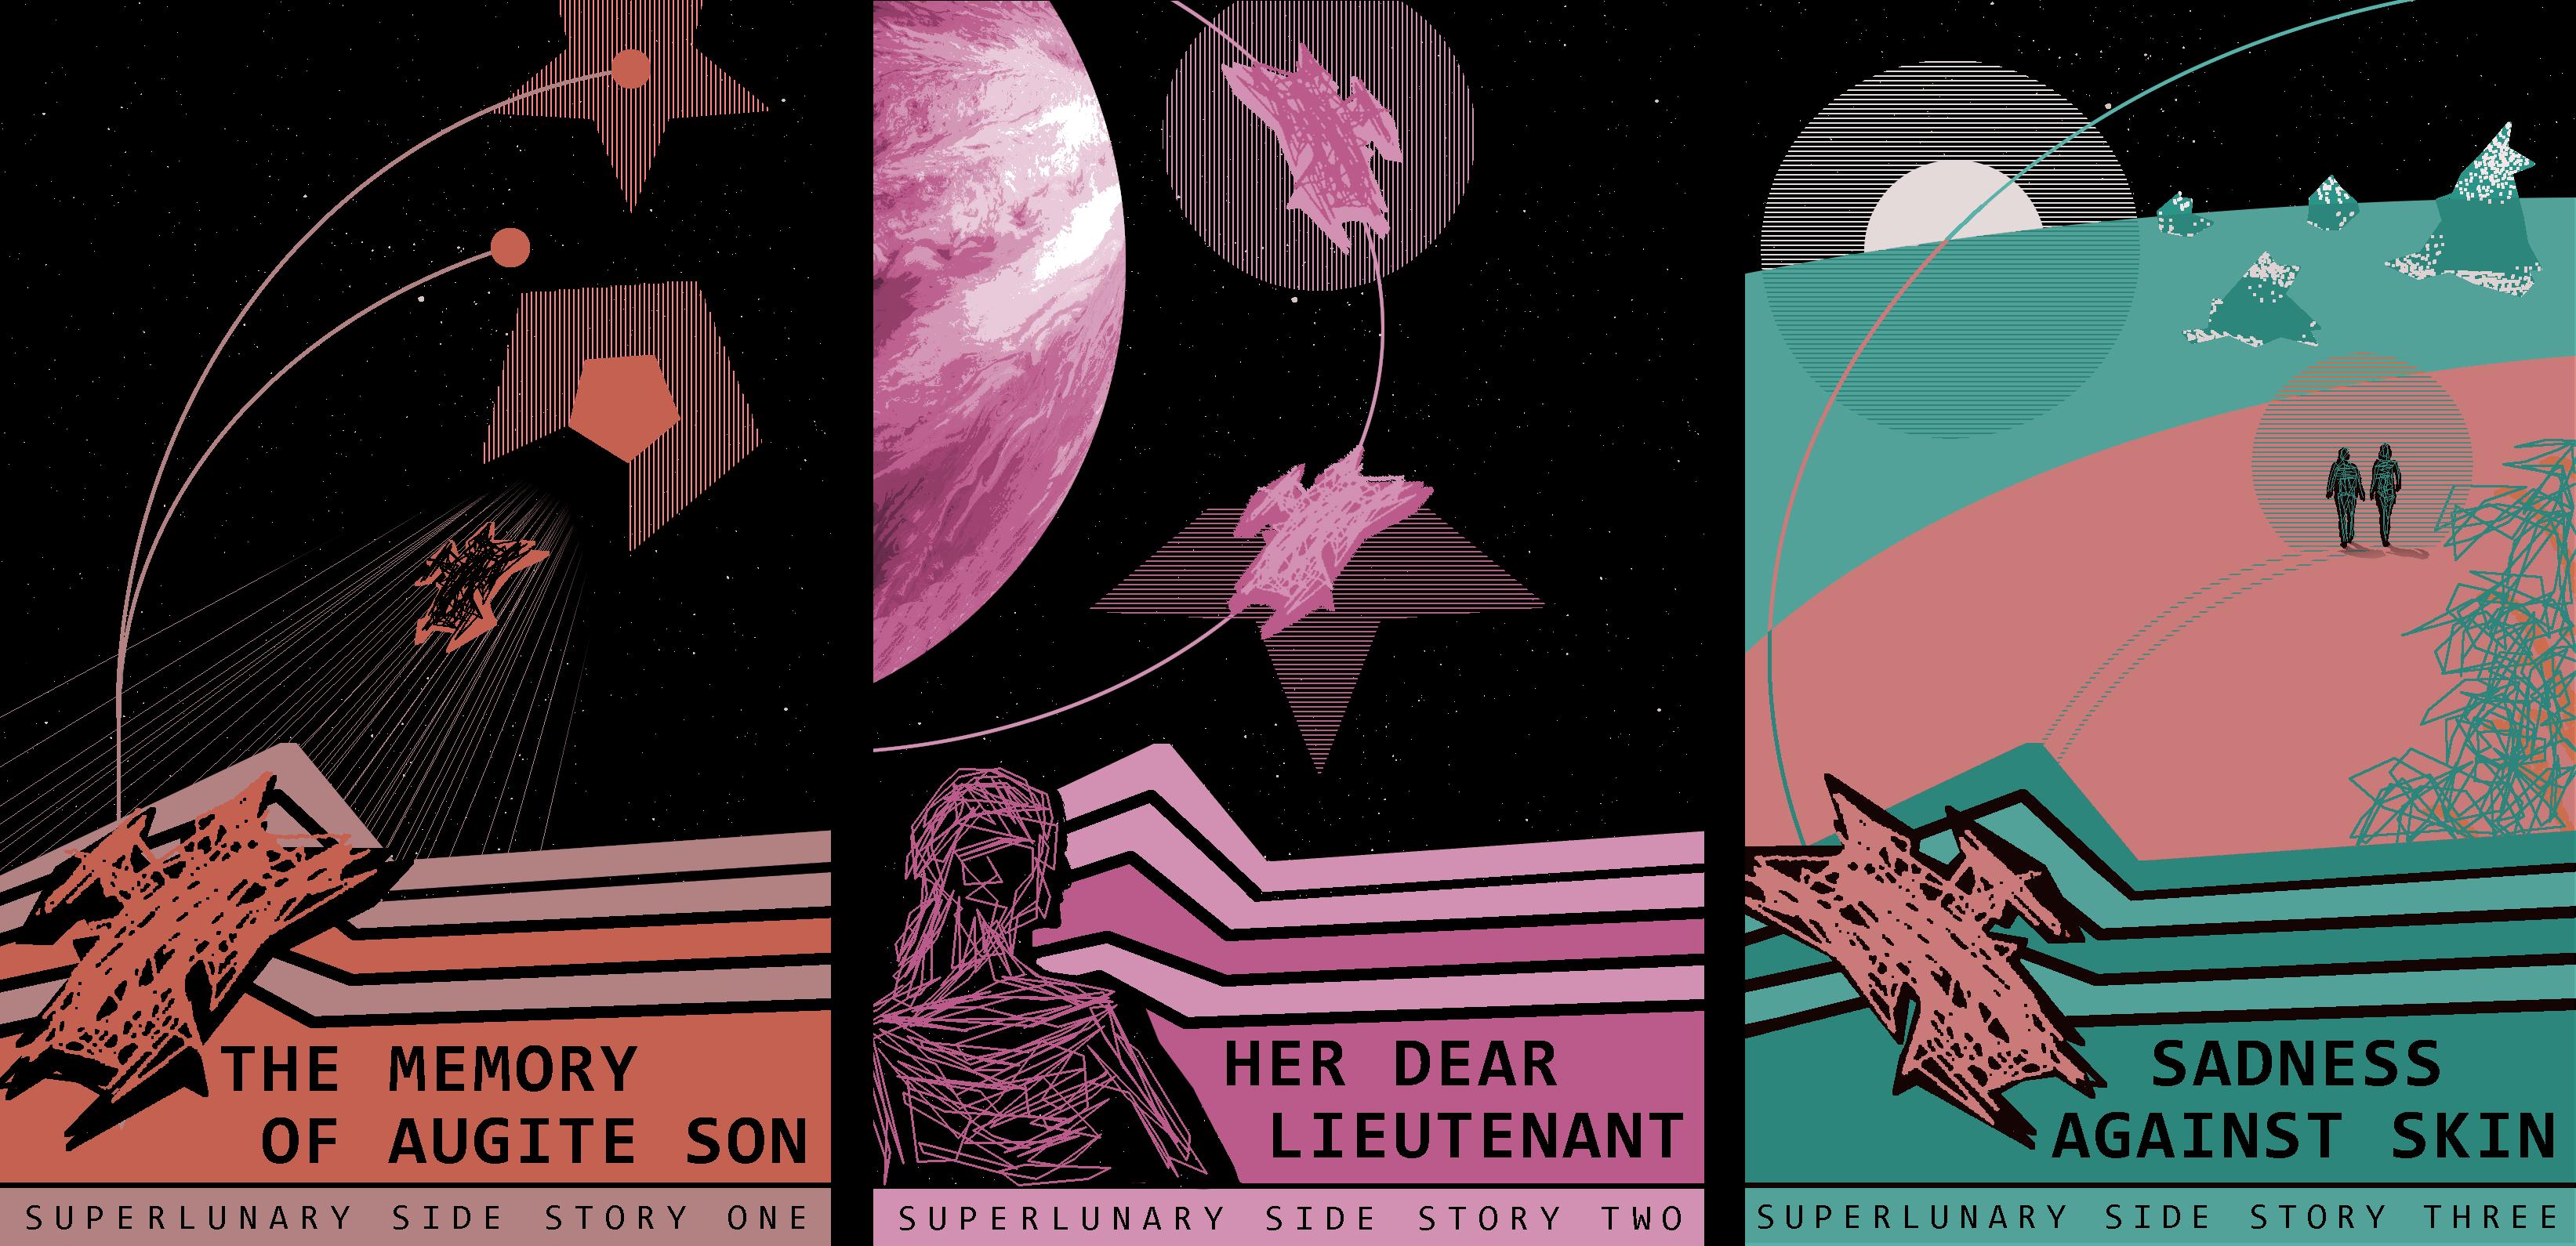 Superlunary Side Stories 1-3